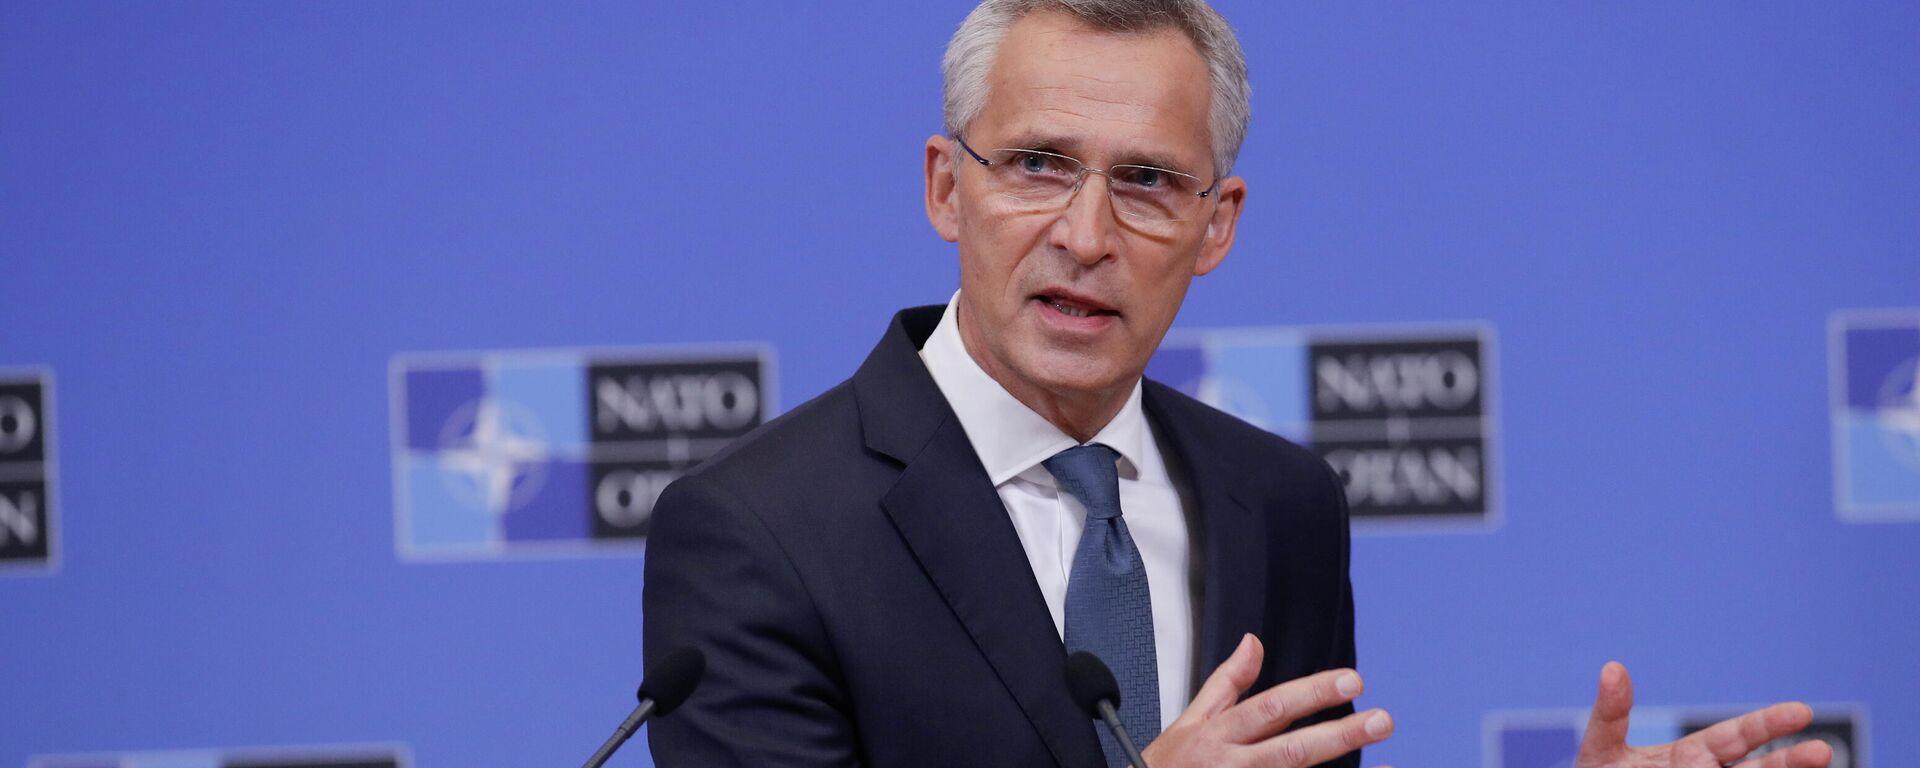 NATO-Generalsekretär Jens Stoltenberg vor der Presse. Brüssel, 31. Mai 2021 - SNA, 1920, 31.05.2021